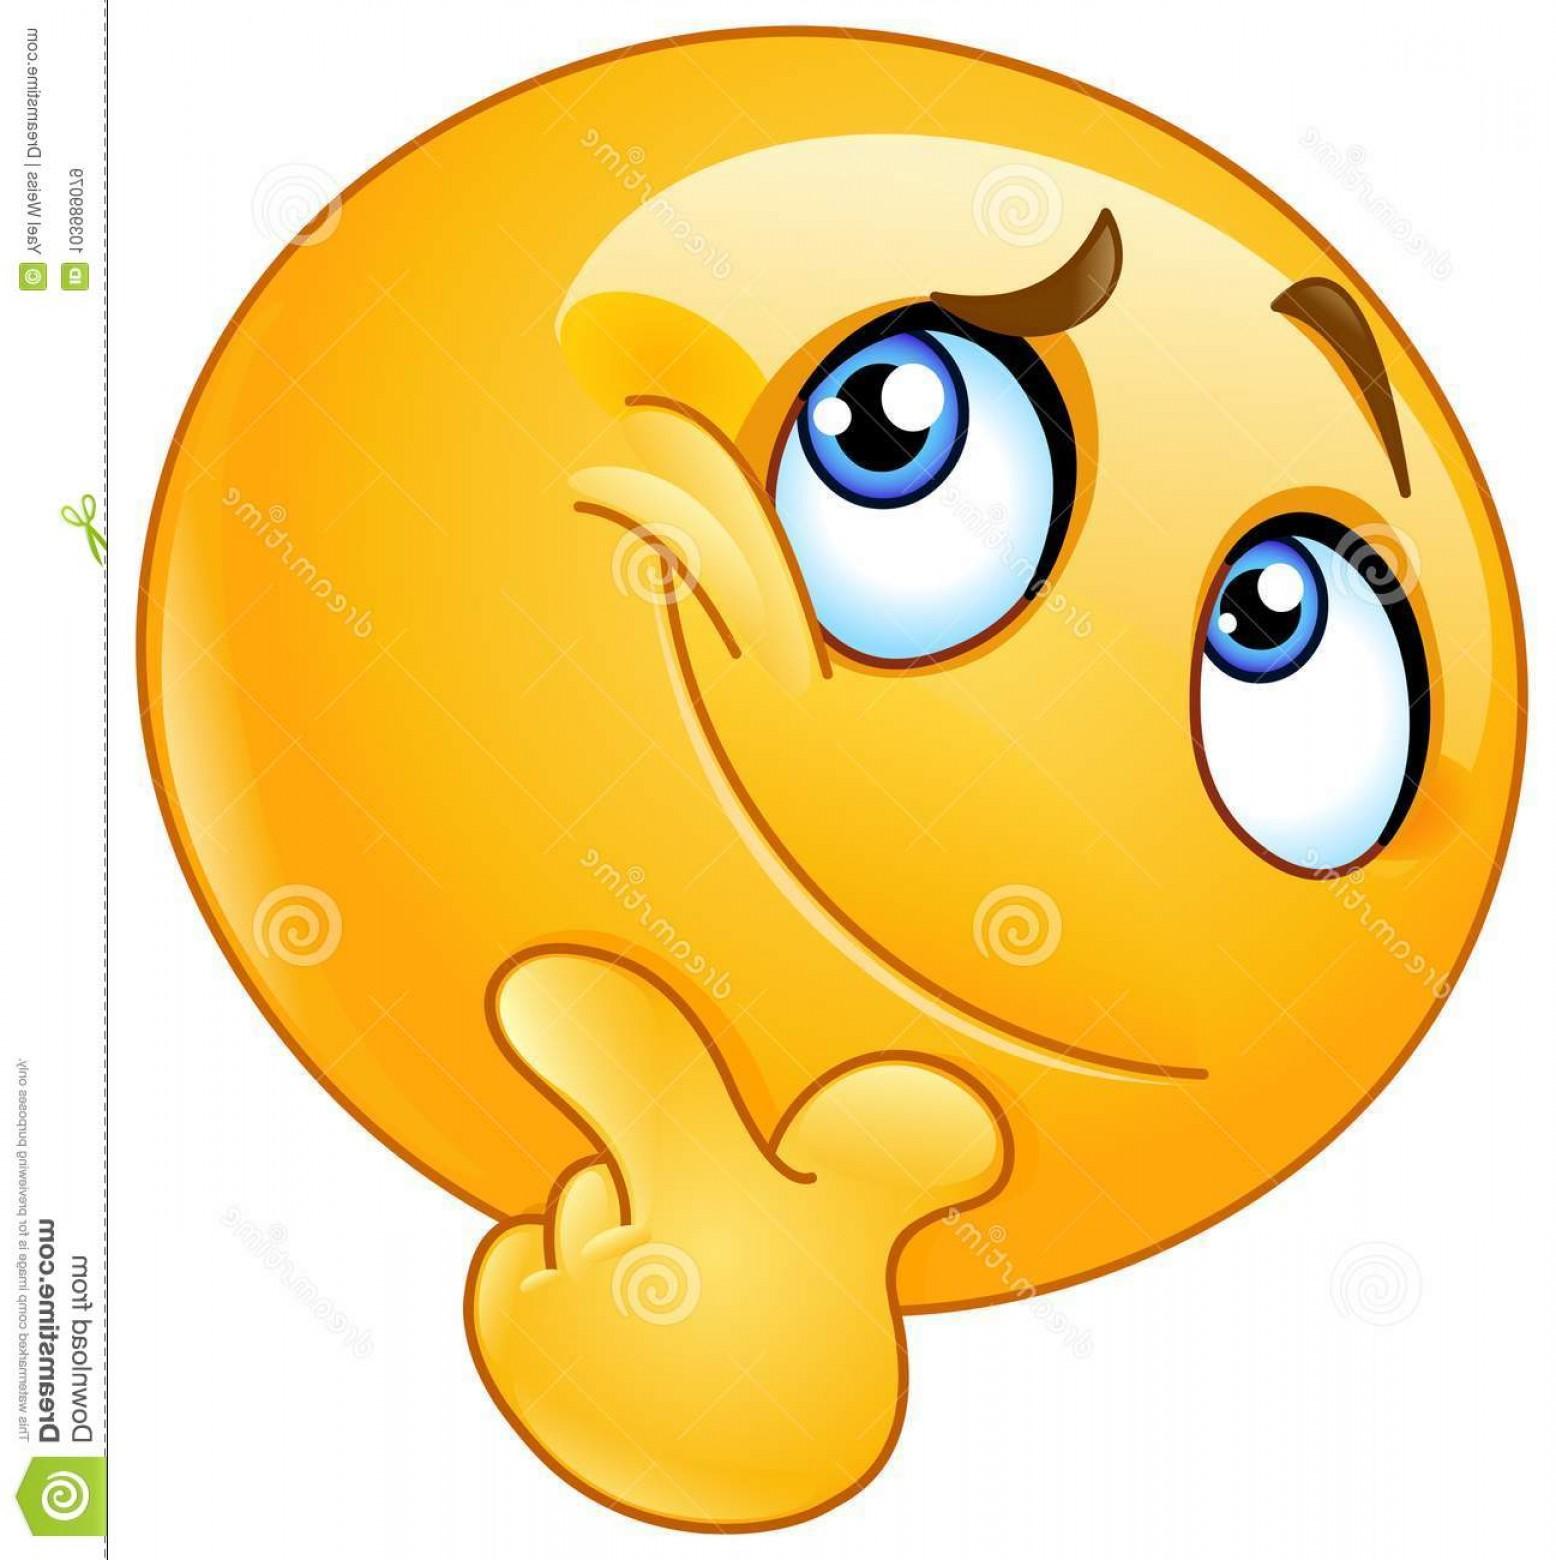 png library stock Vector emojis single. Emoji soidergi